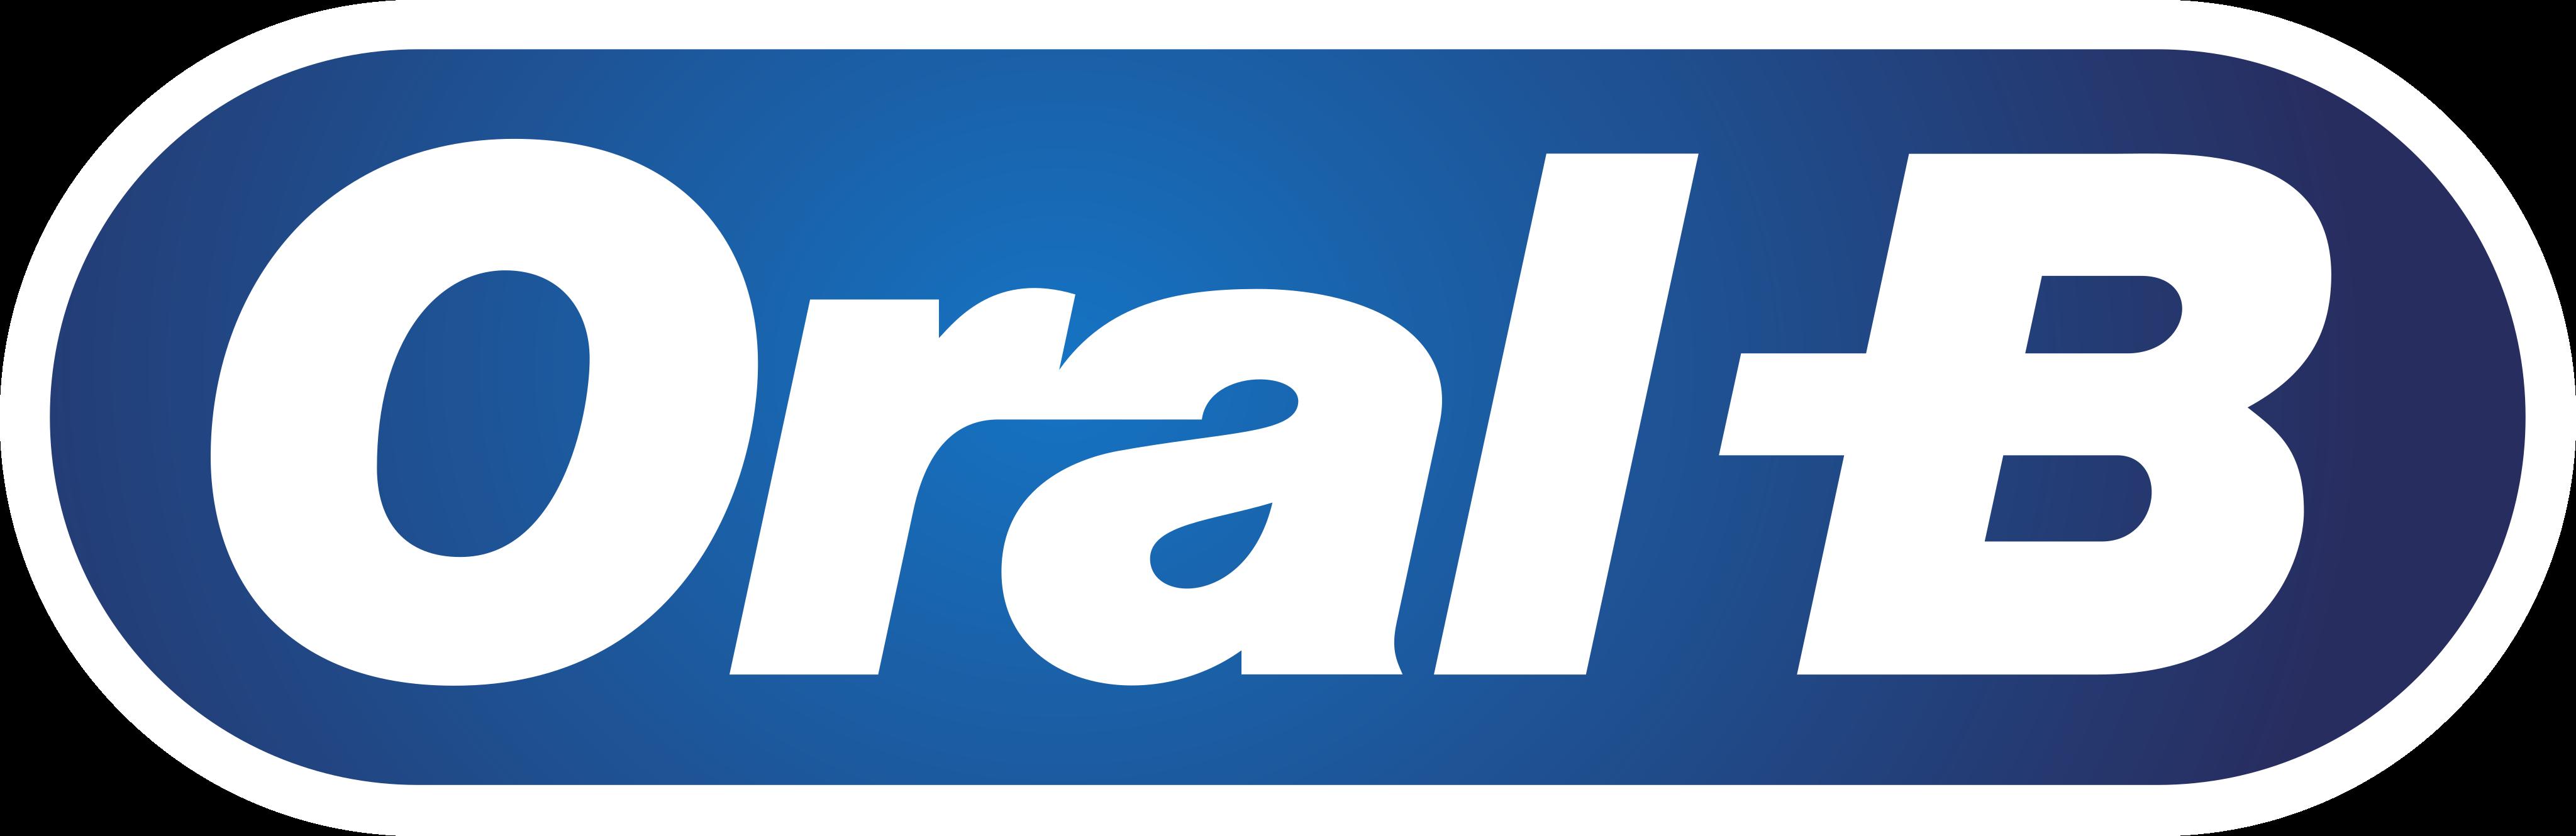 oral b logo 8 - Oral-B Logo